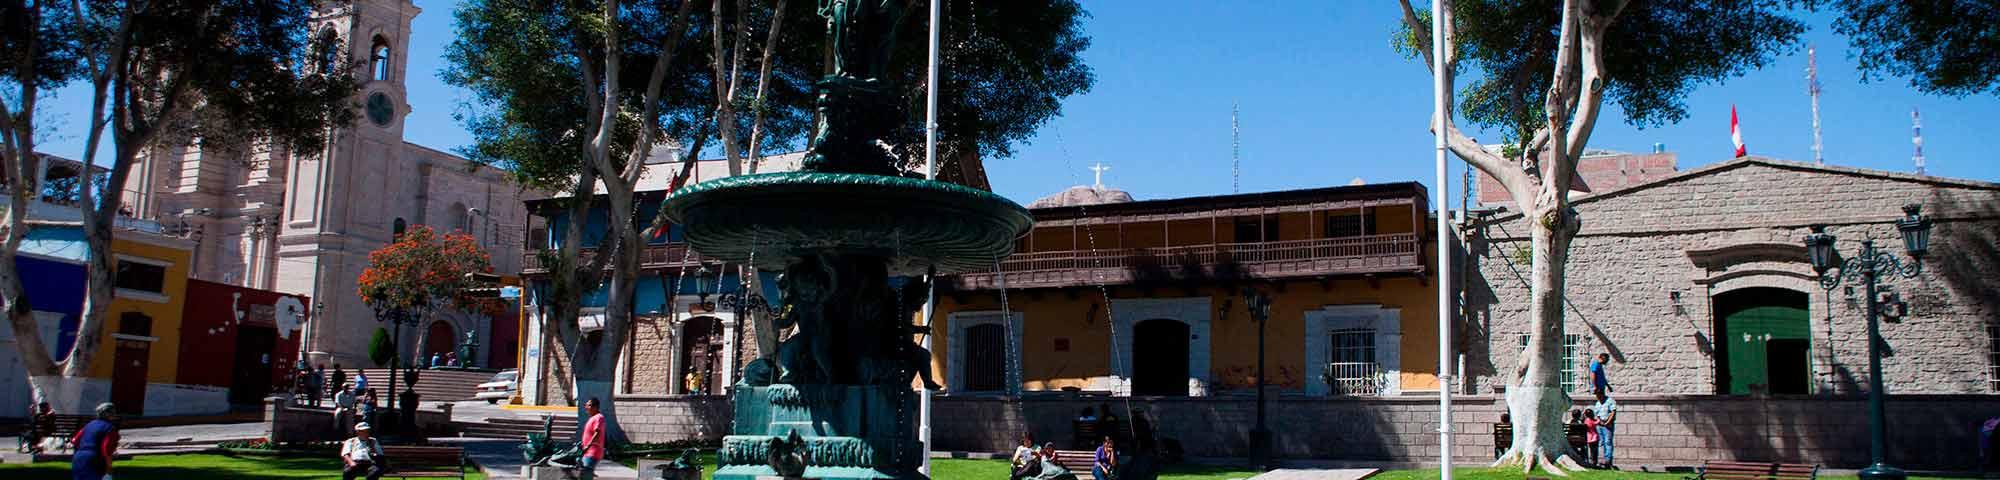 Plaza Mayor de Moquegua